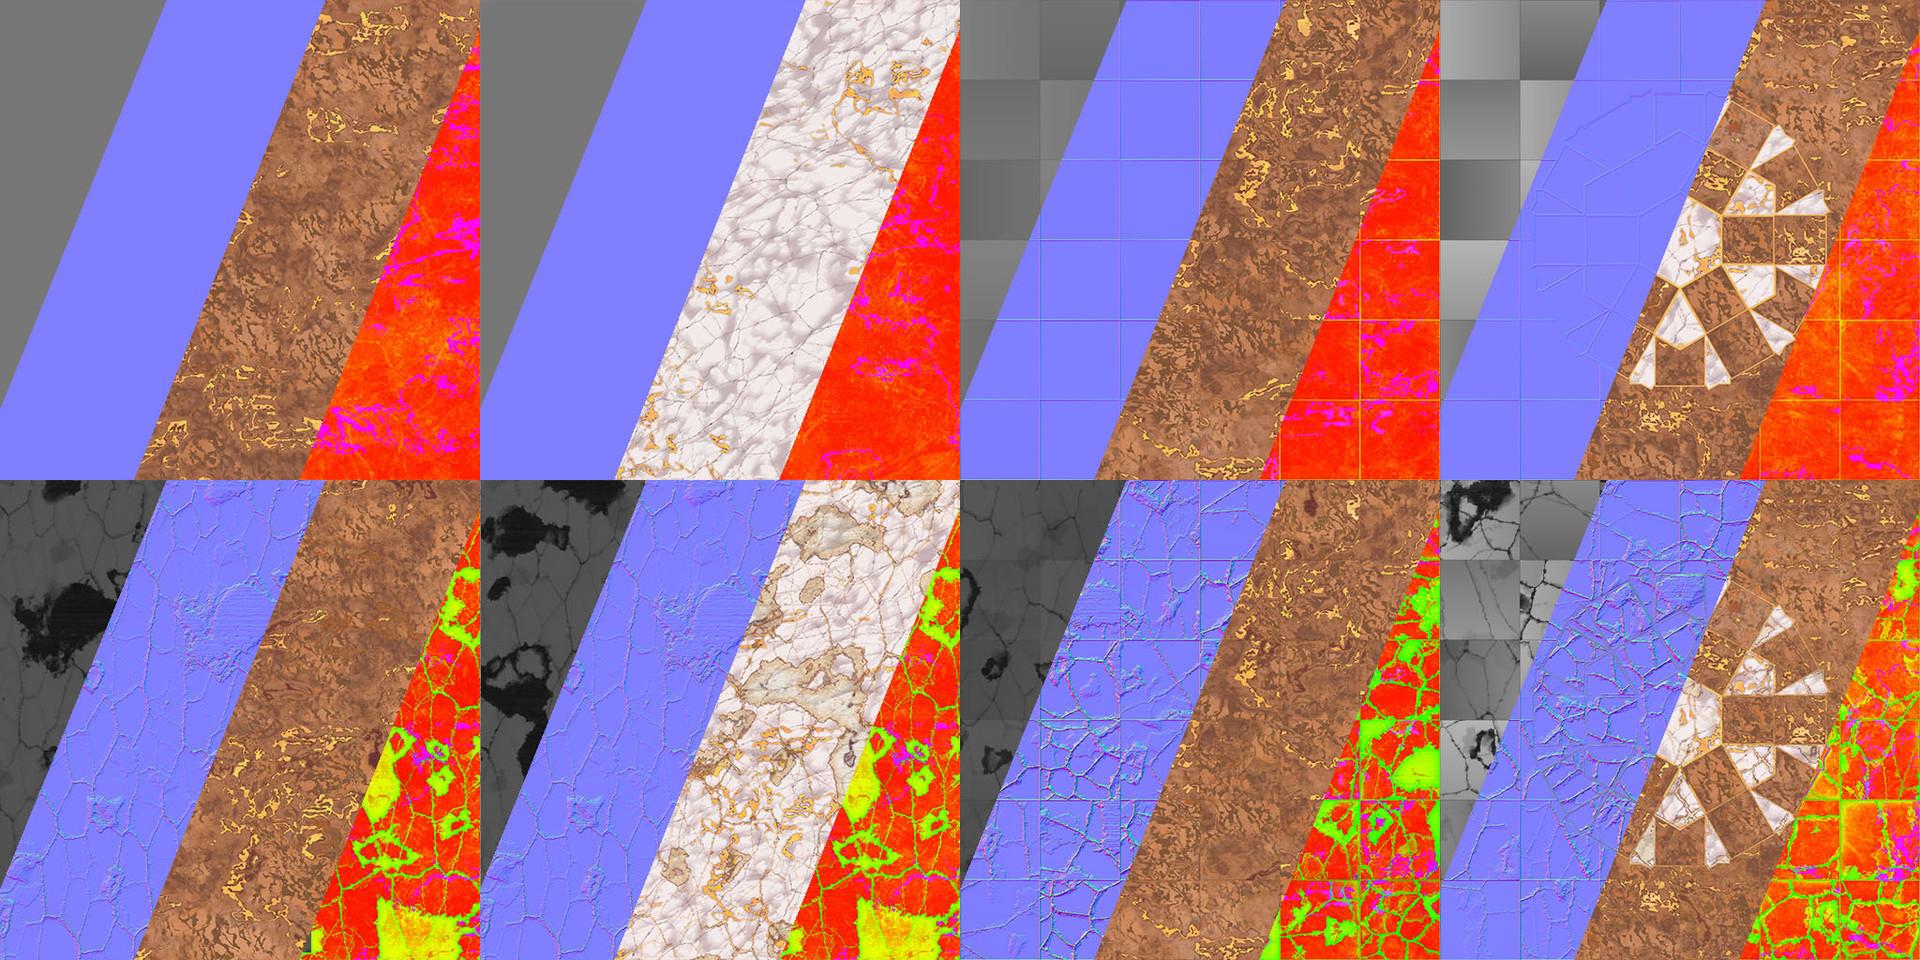 Jona marklund jona marklund biweeklysubstance02 marble textures